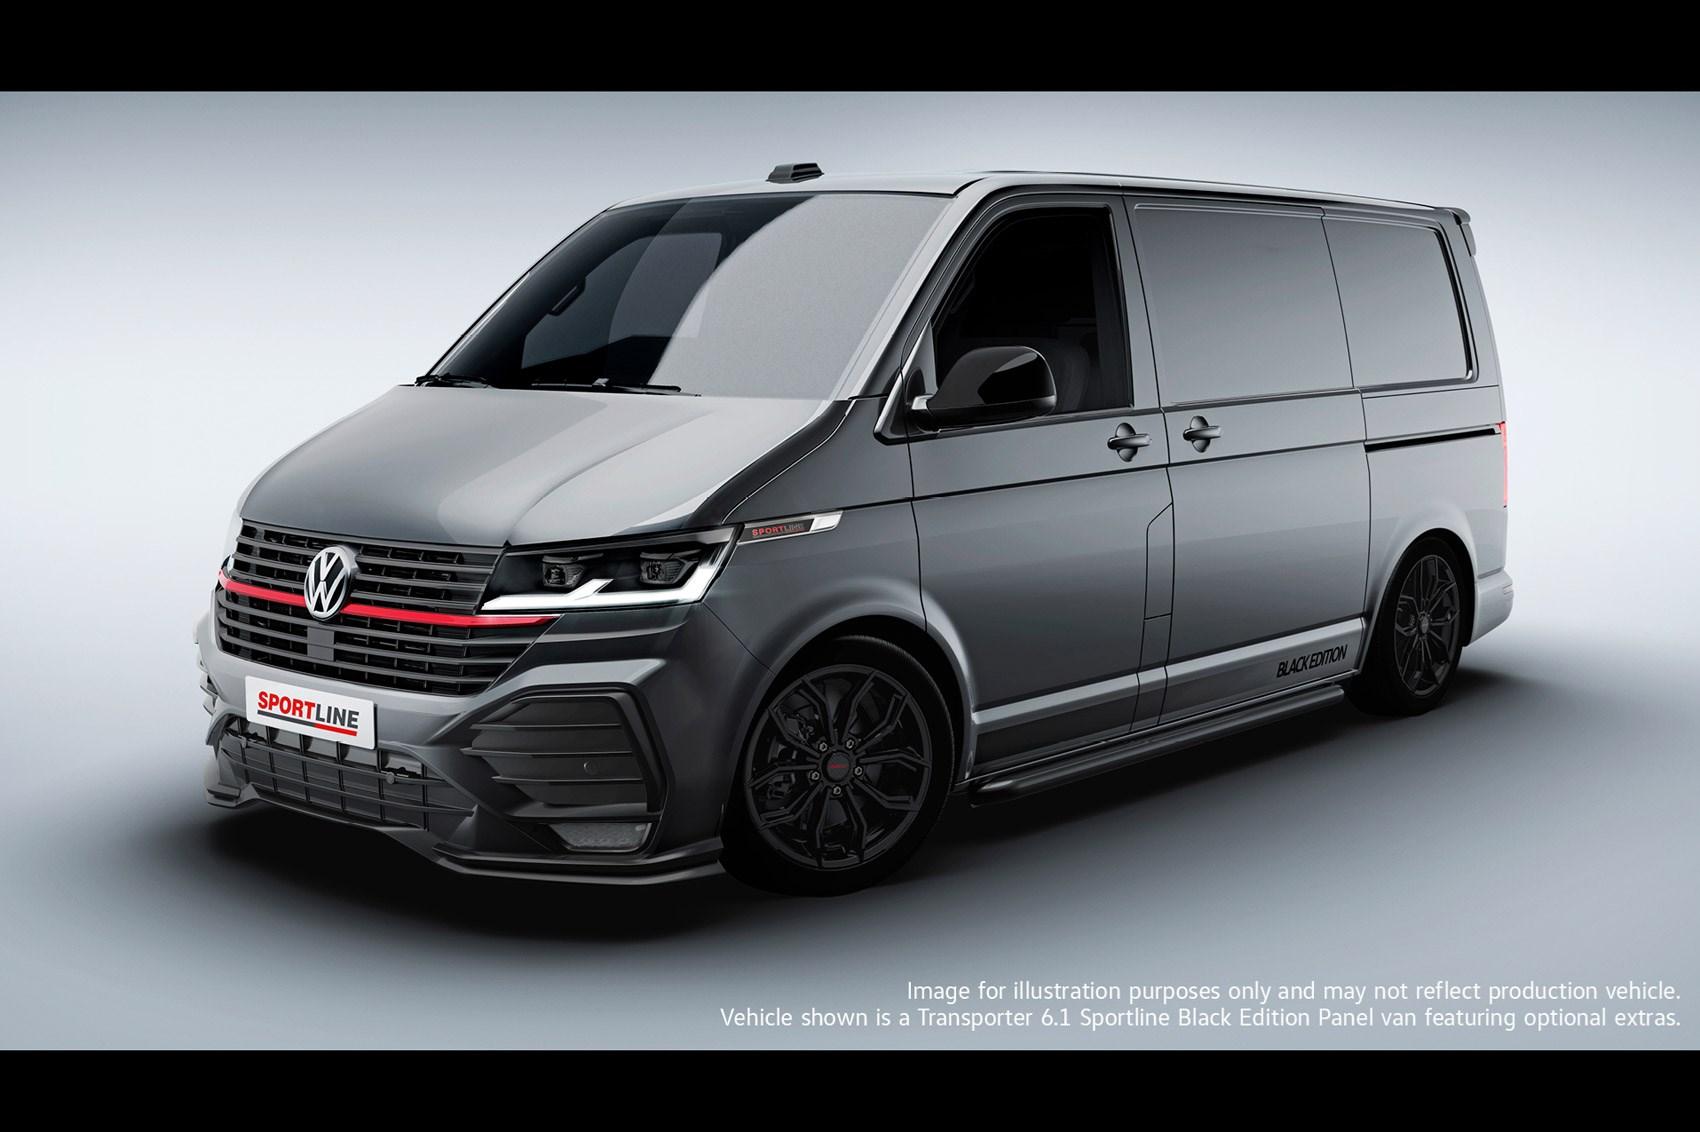 2021 VW Transporter 6.1 Sportline - front view, grey